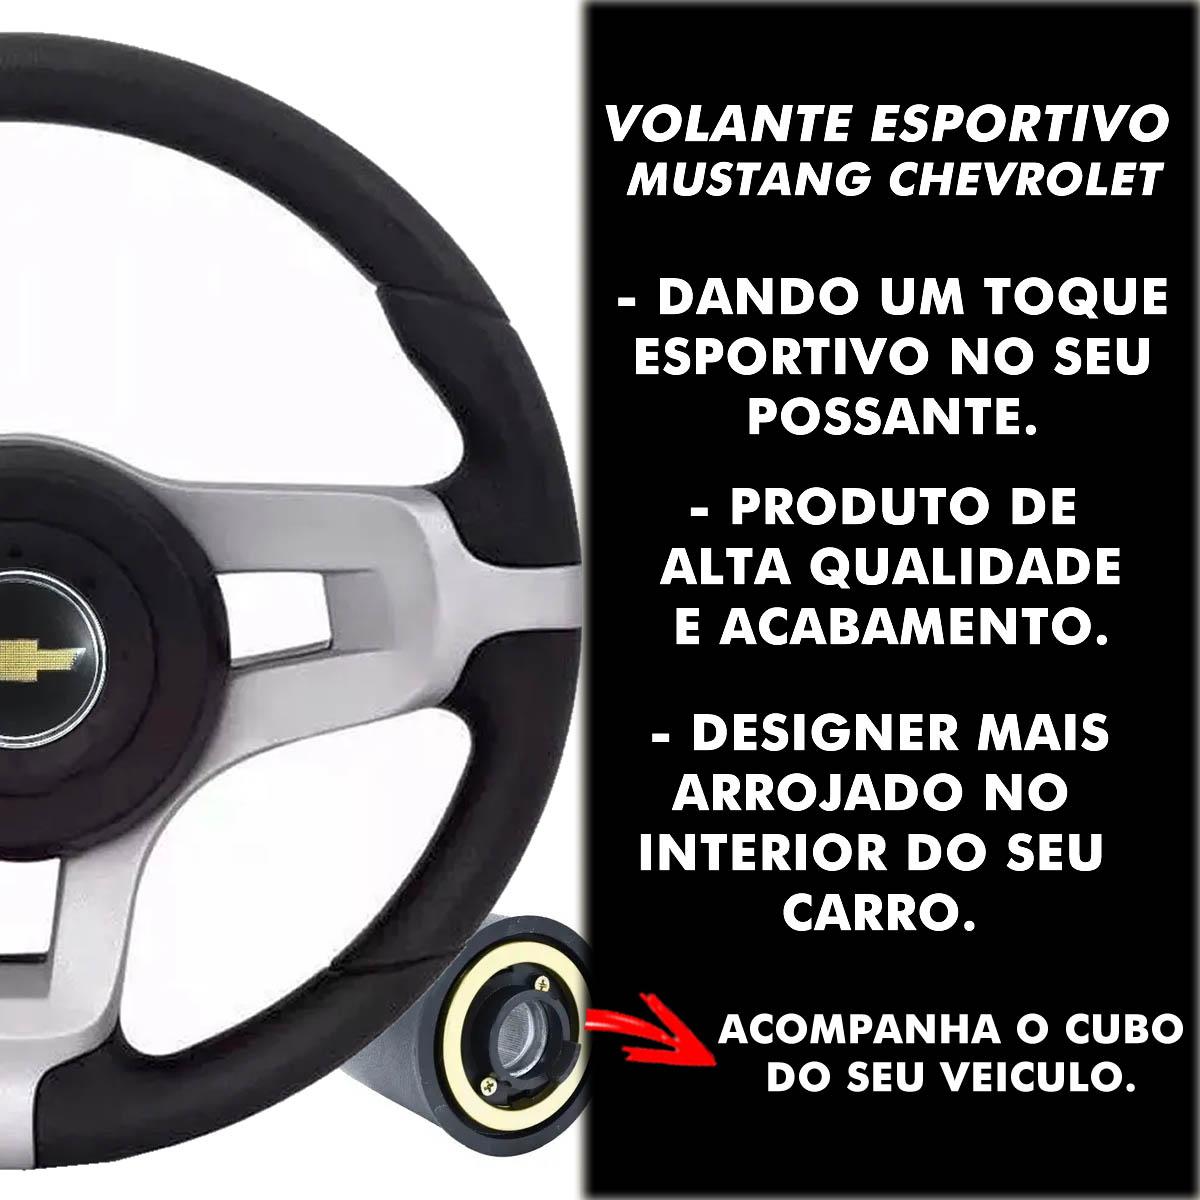 Volante Chevrolet Mustang Esportivo Cubo S10 Blazer Silverado 1995 a 2013 Opala Chevette 1968 a 1998 Poliparts